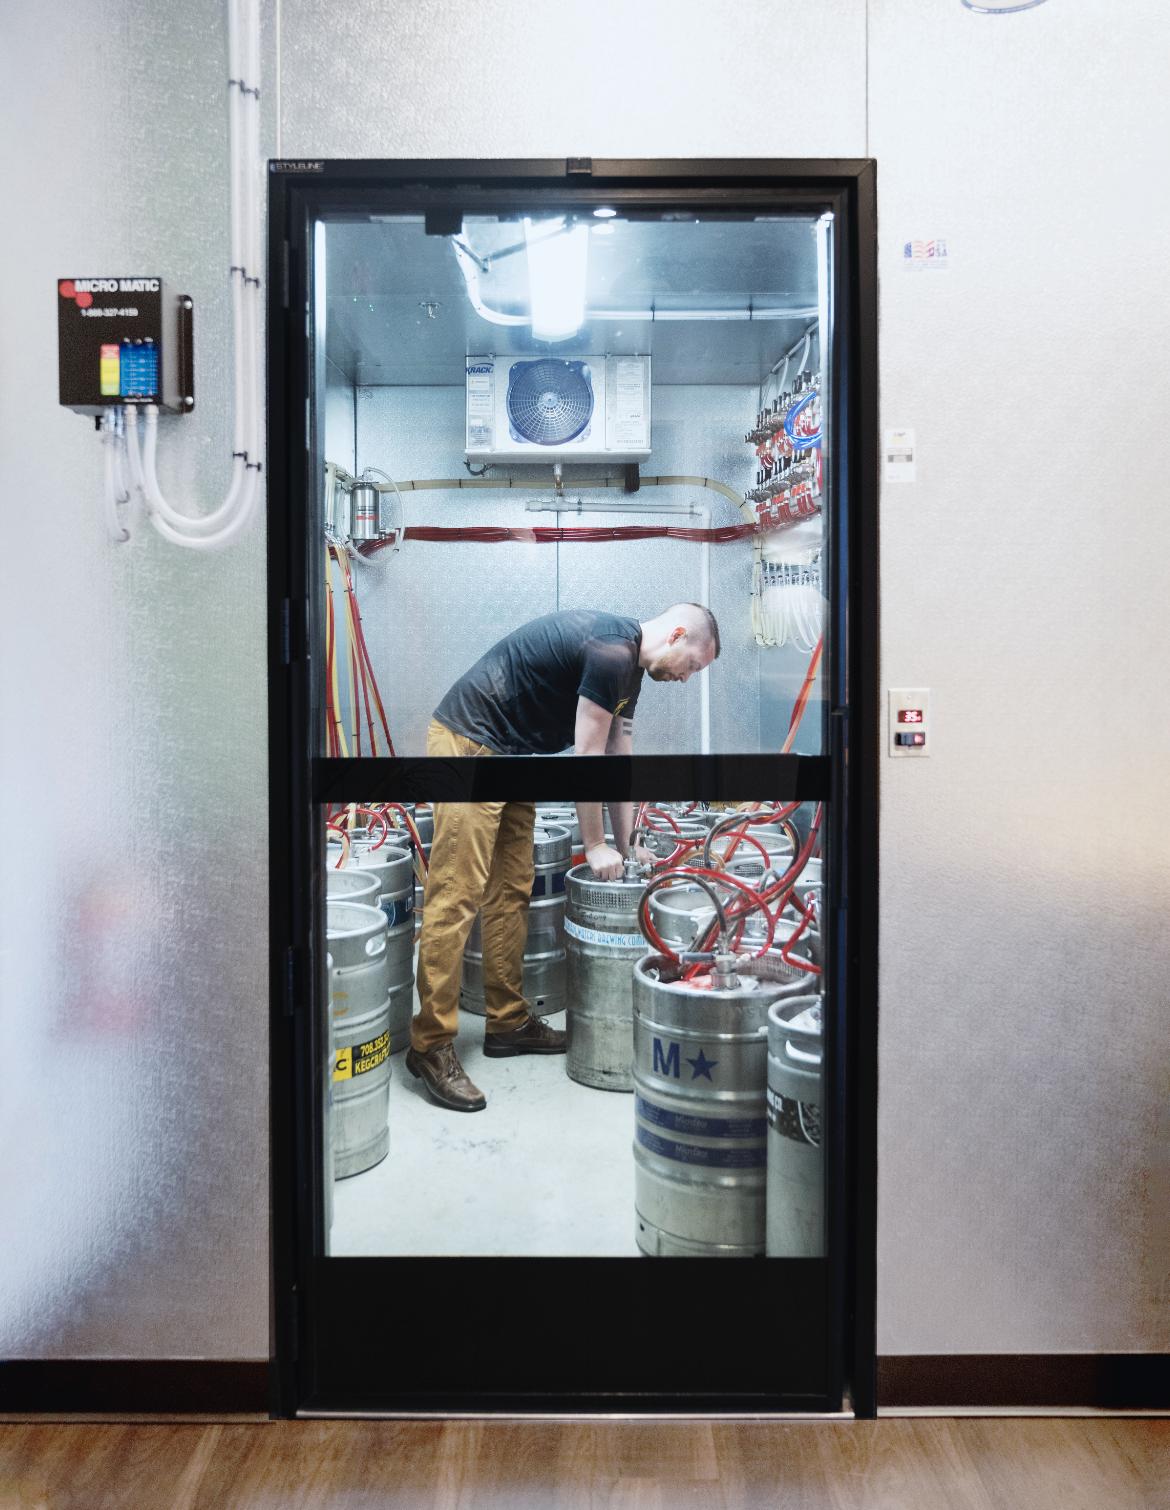 Garth In Garth's Brew Bar Cooler